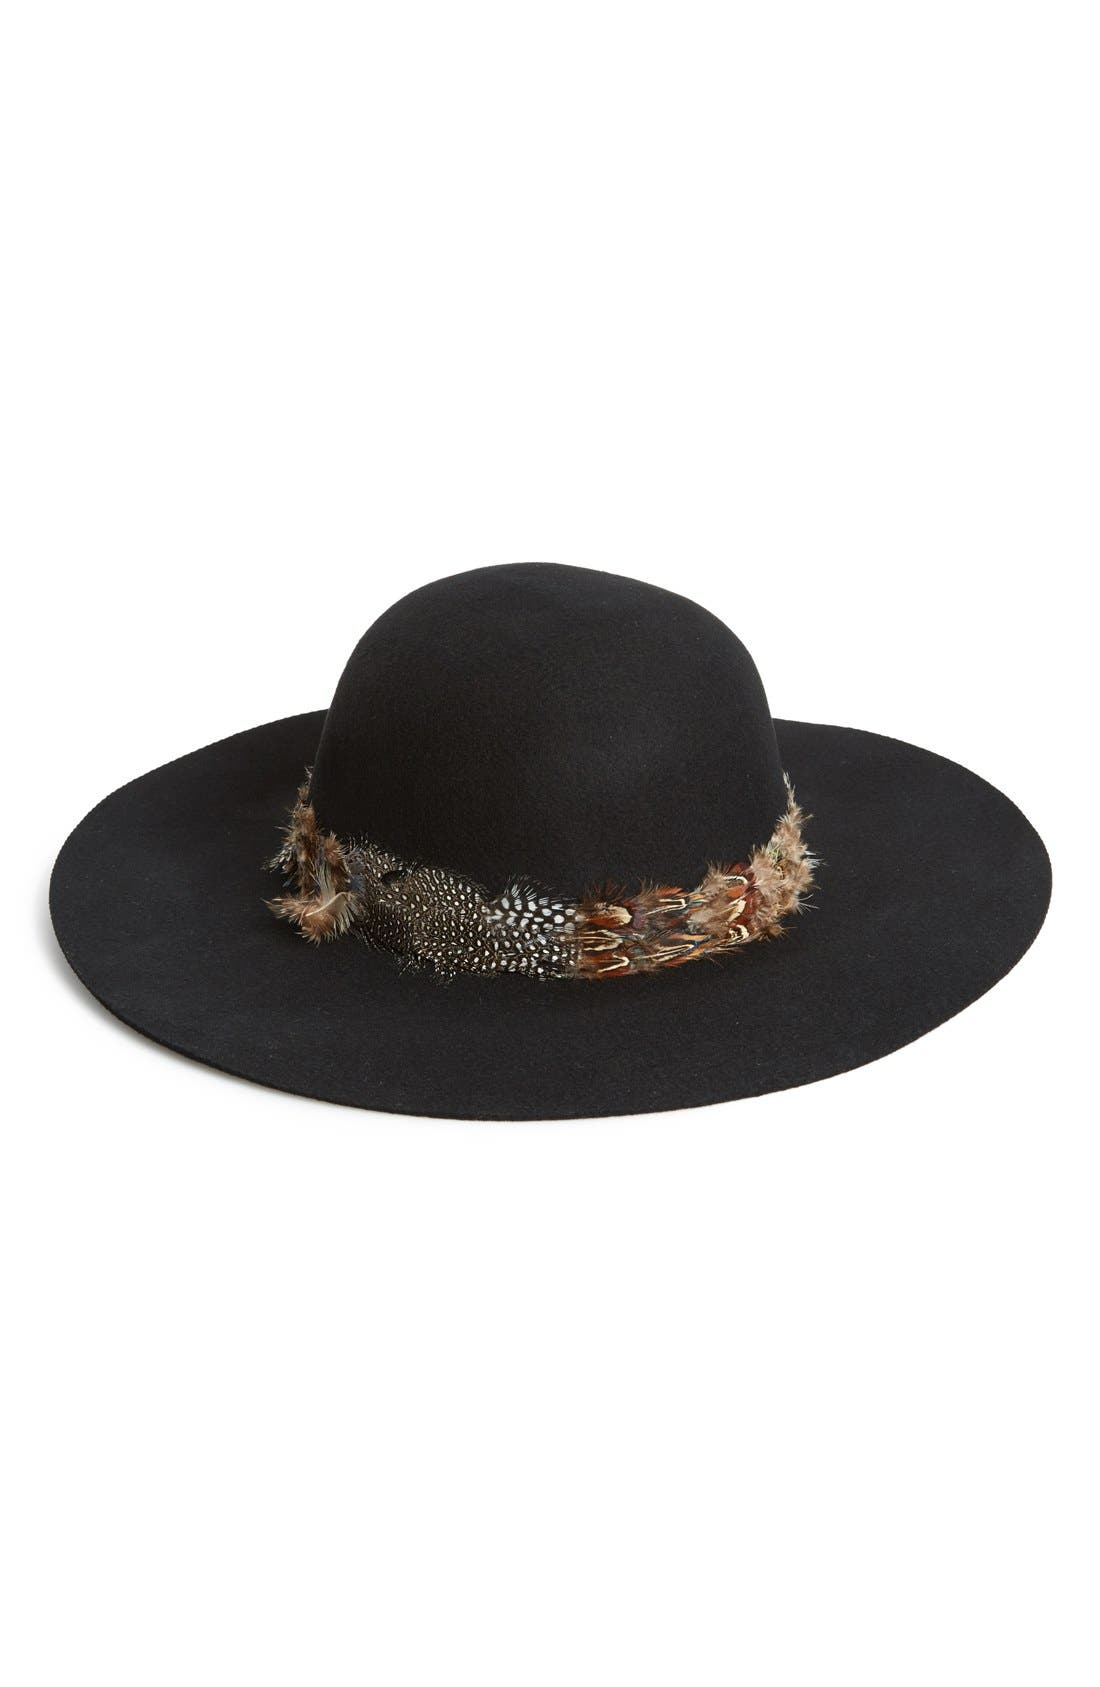 Alternate Image 1 Selected - Christys' Hats 'Kearny' Floppy Felt Hat